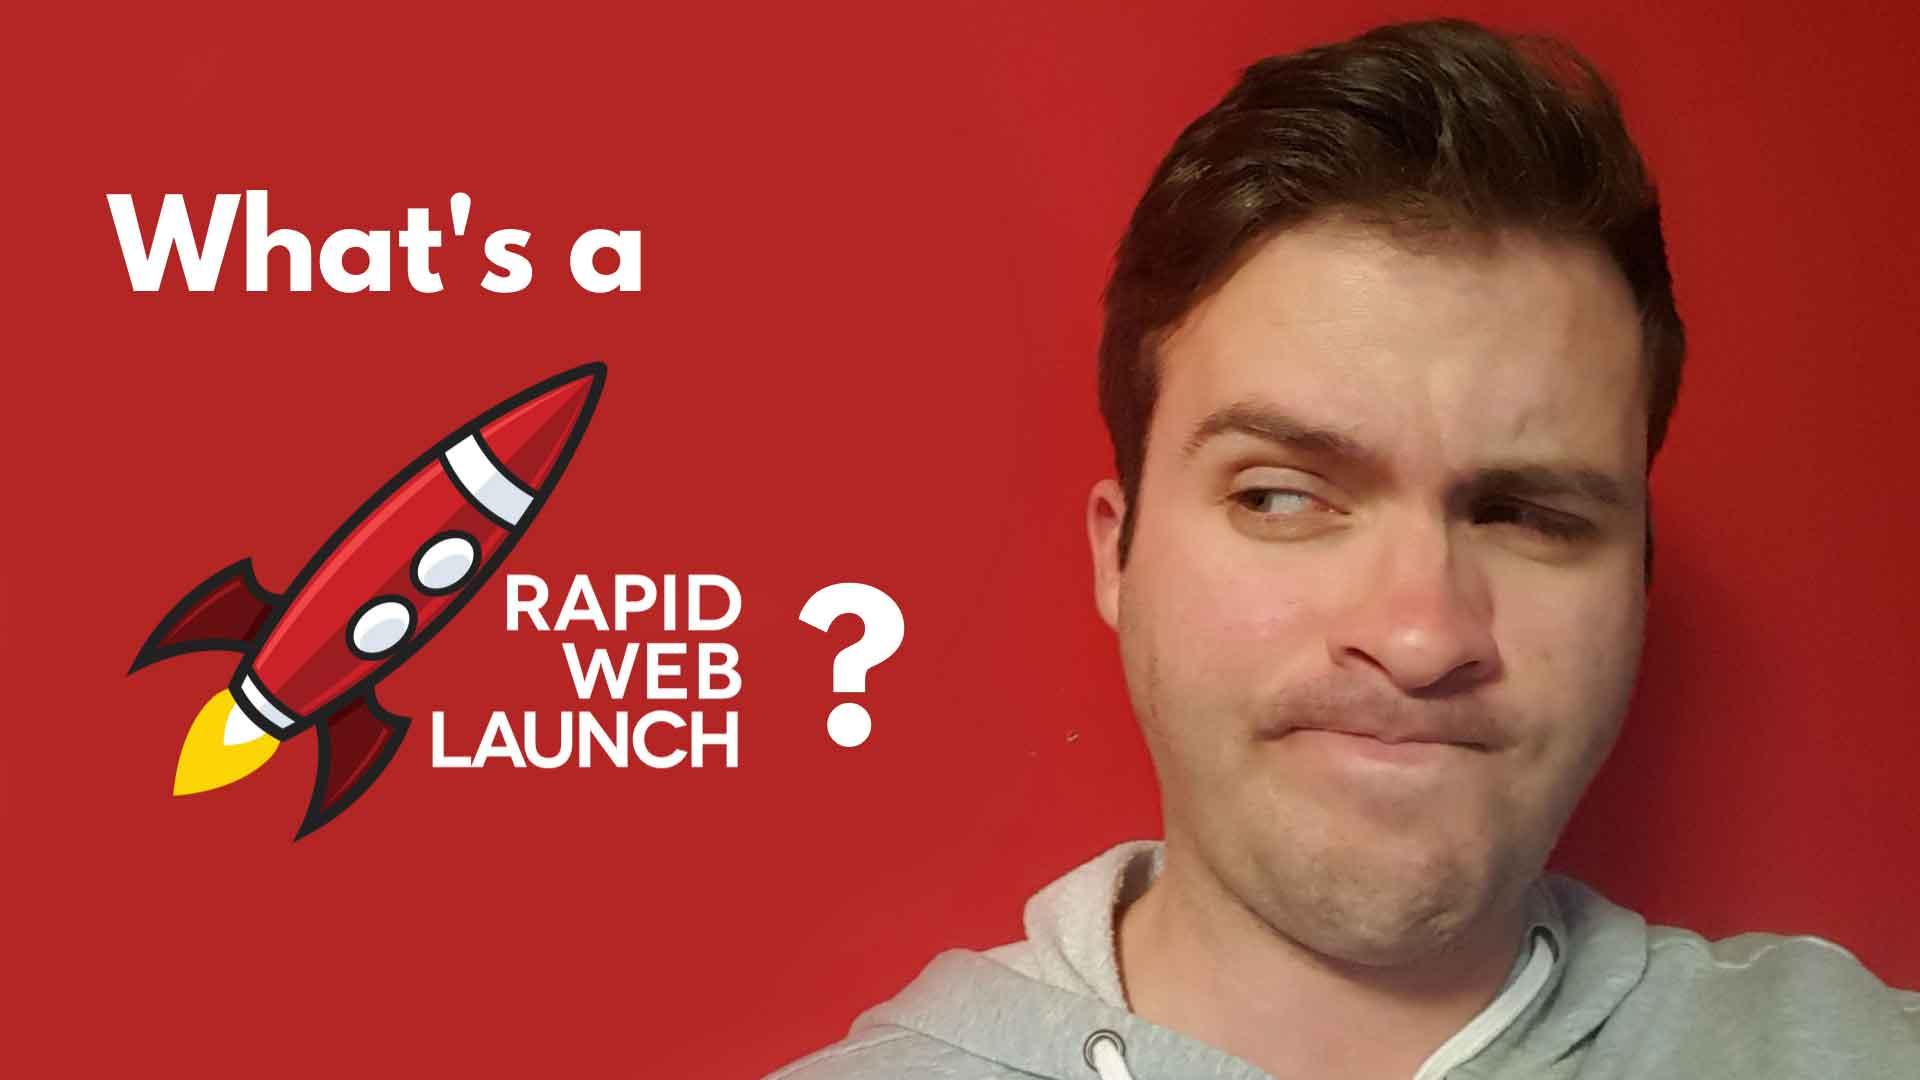 what is rapidweblaunch